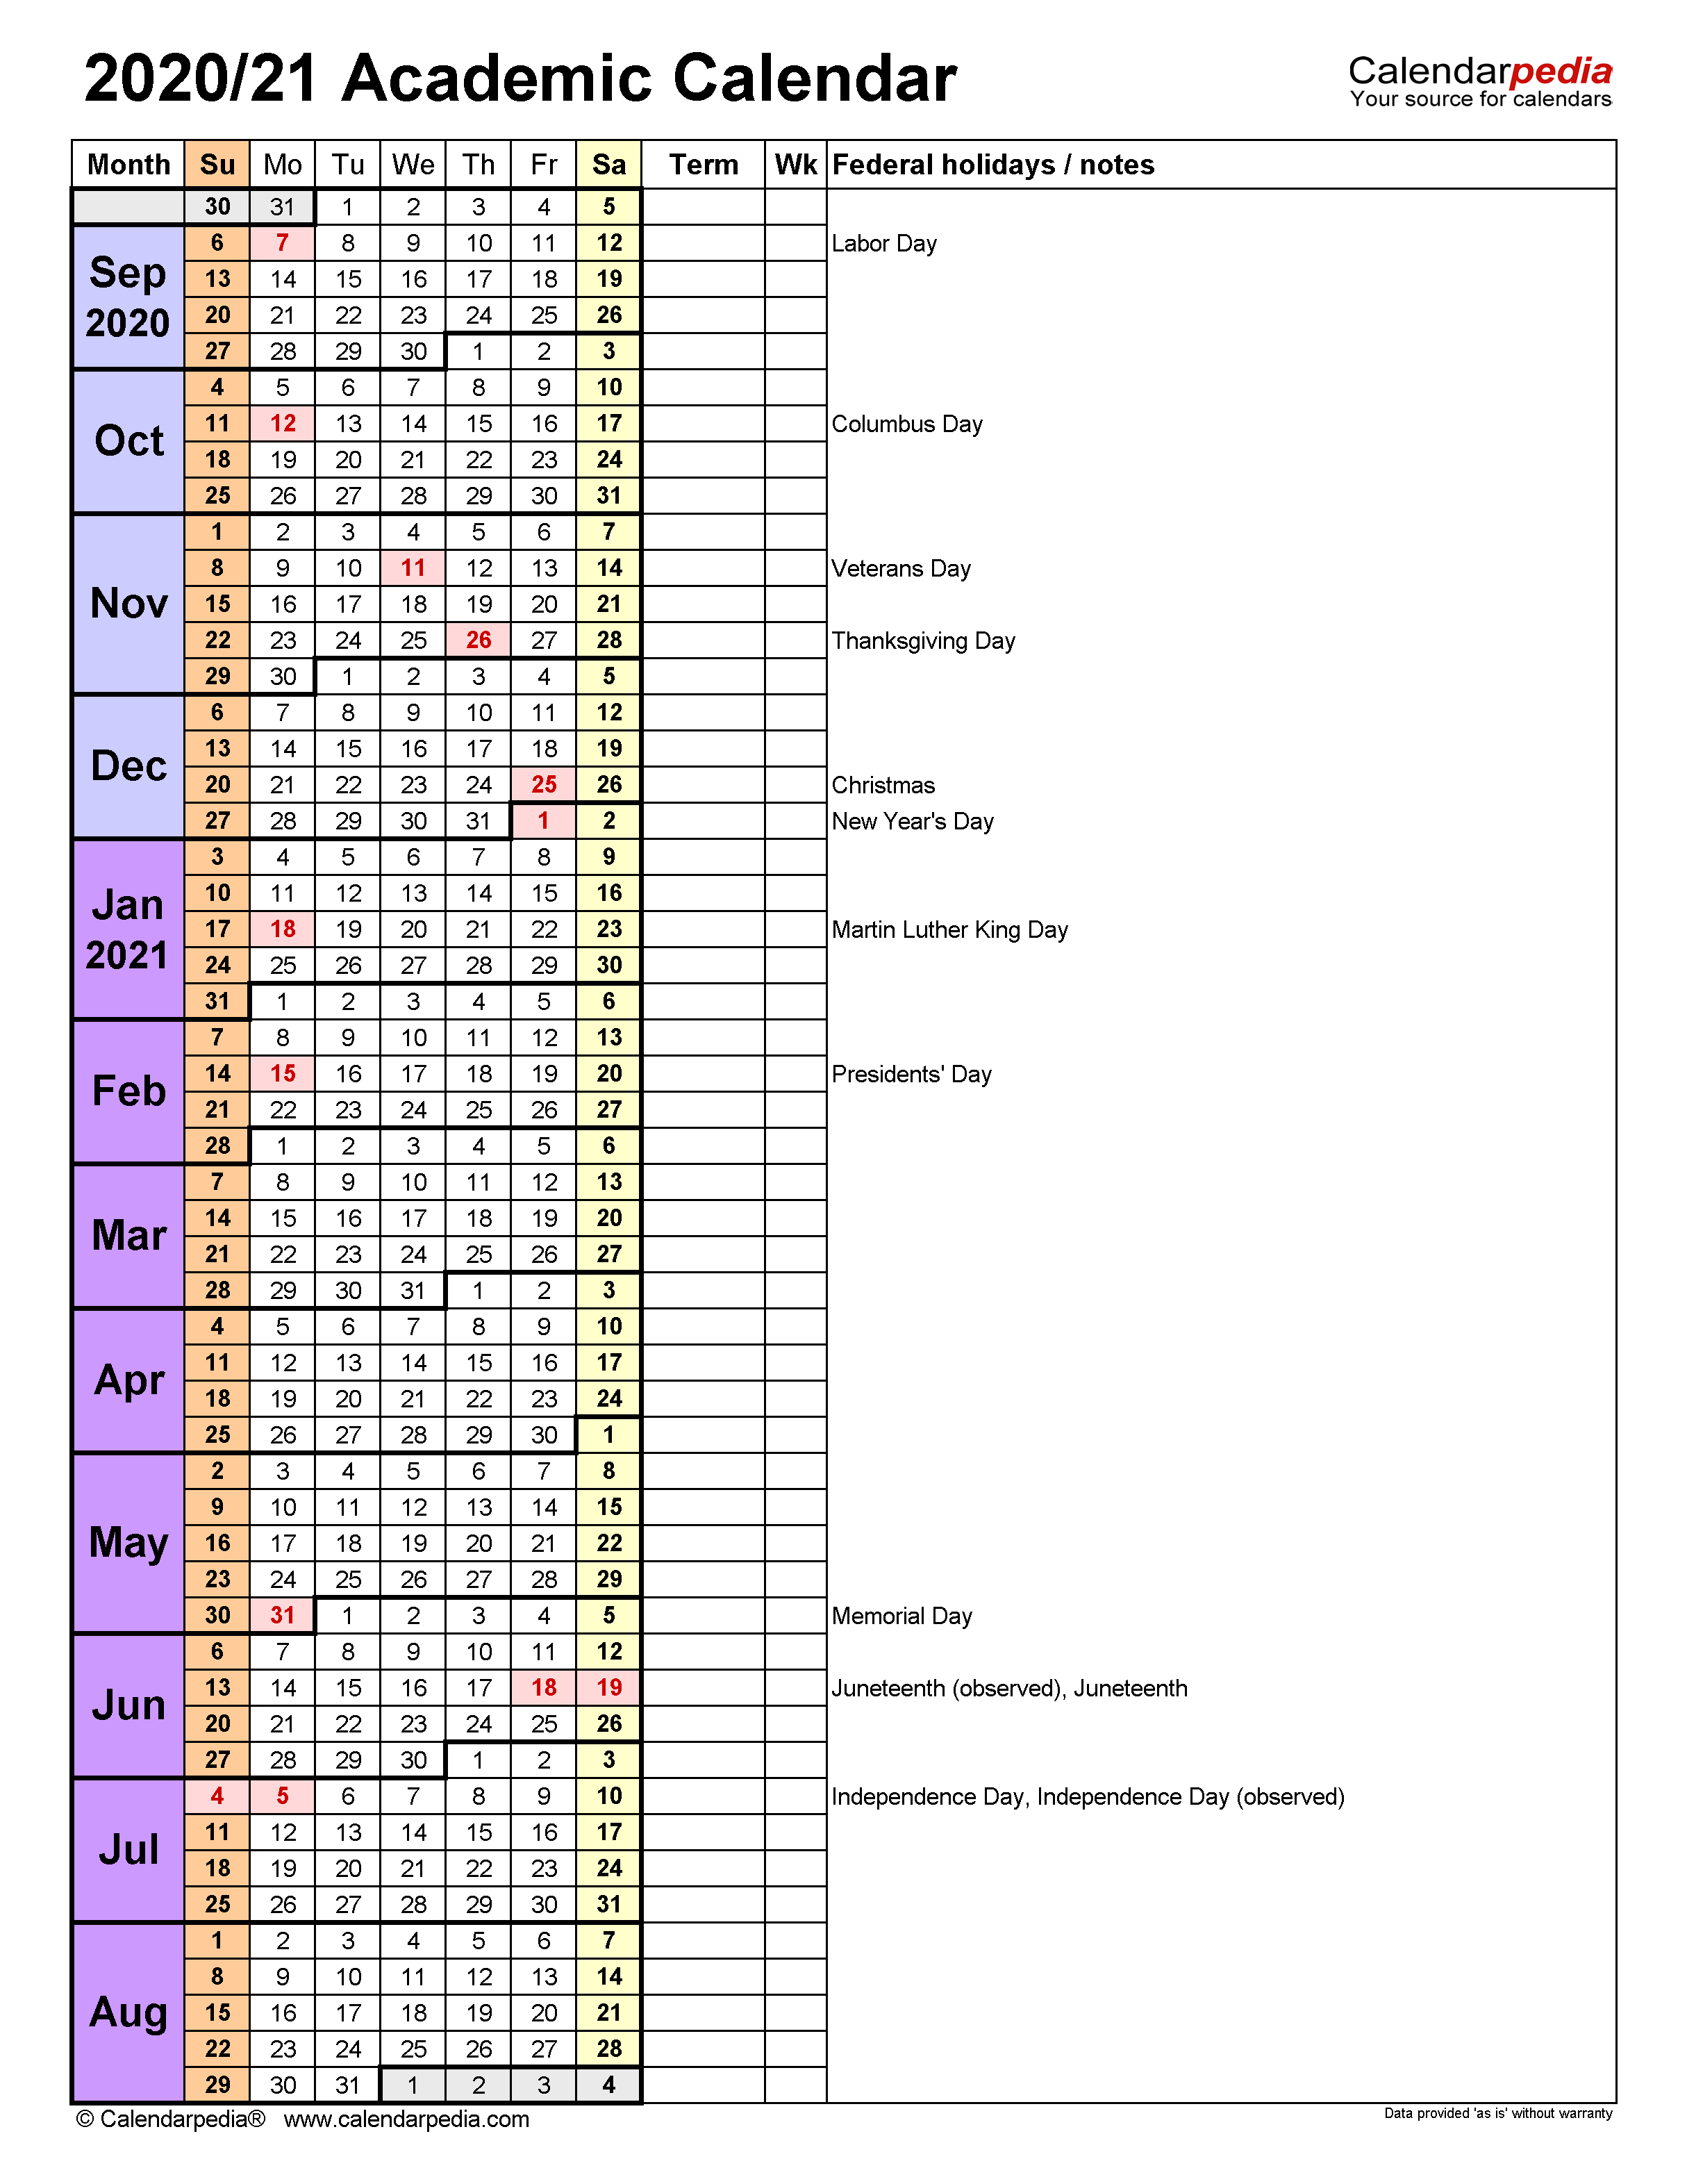 U Of U Academic Calendar 2022.Academic Calendars 2020 2021 Free Printable Word Templates